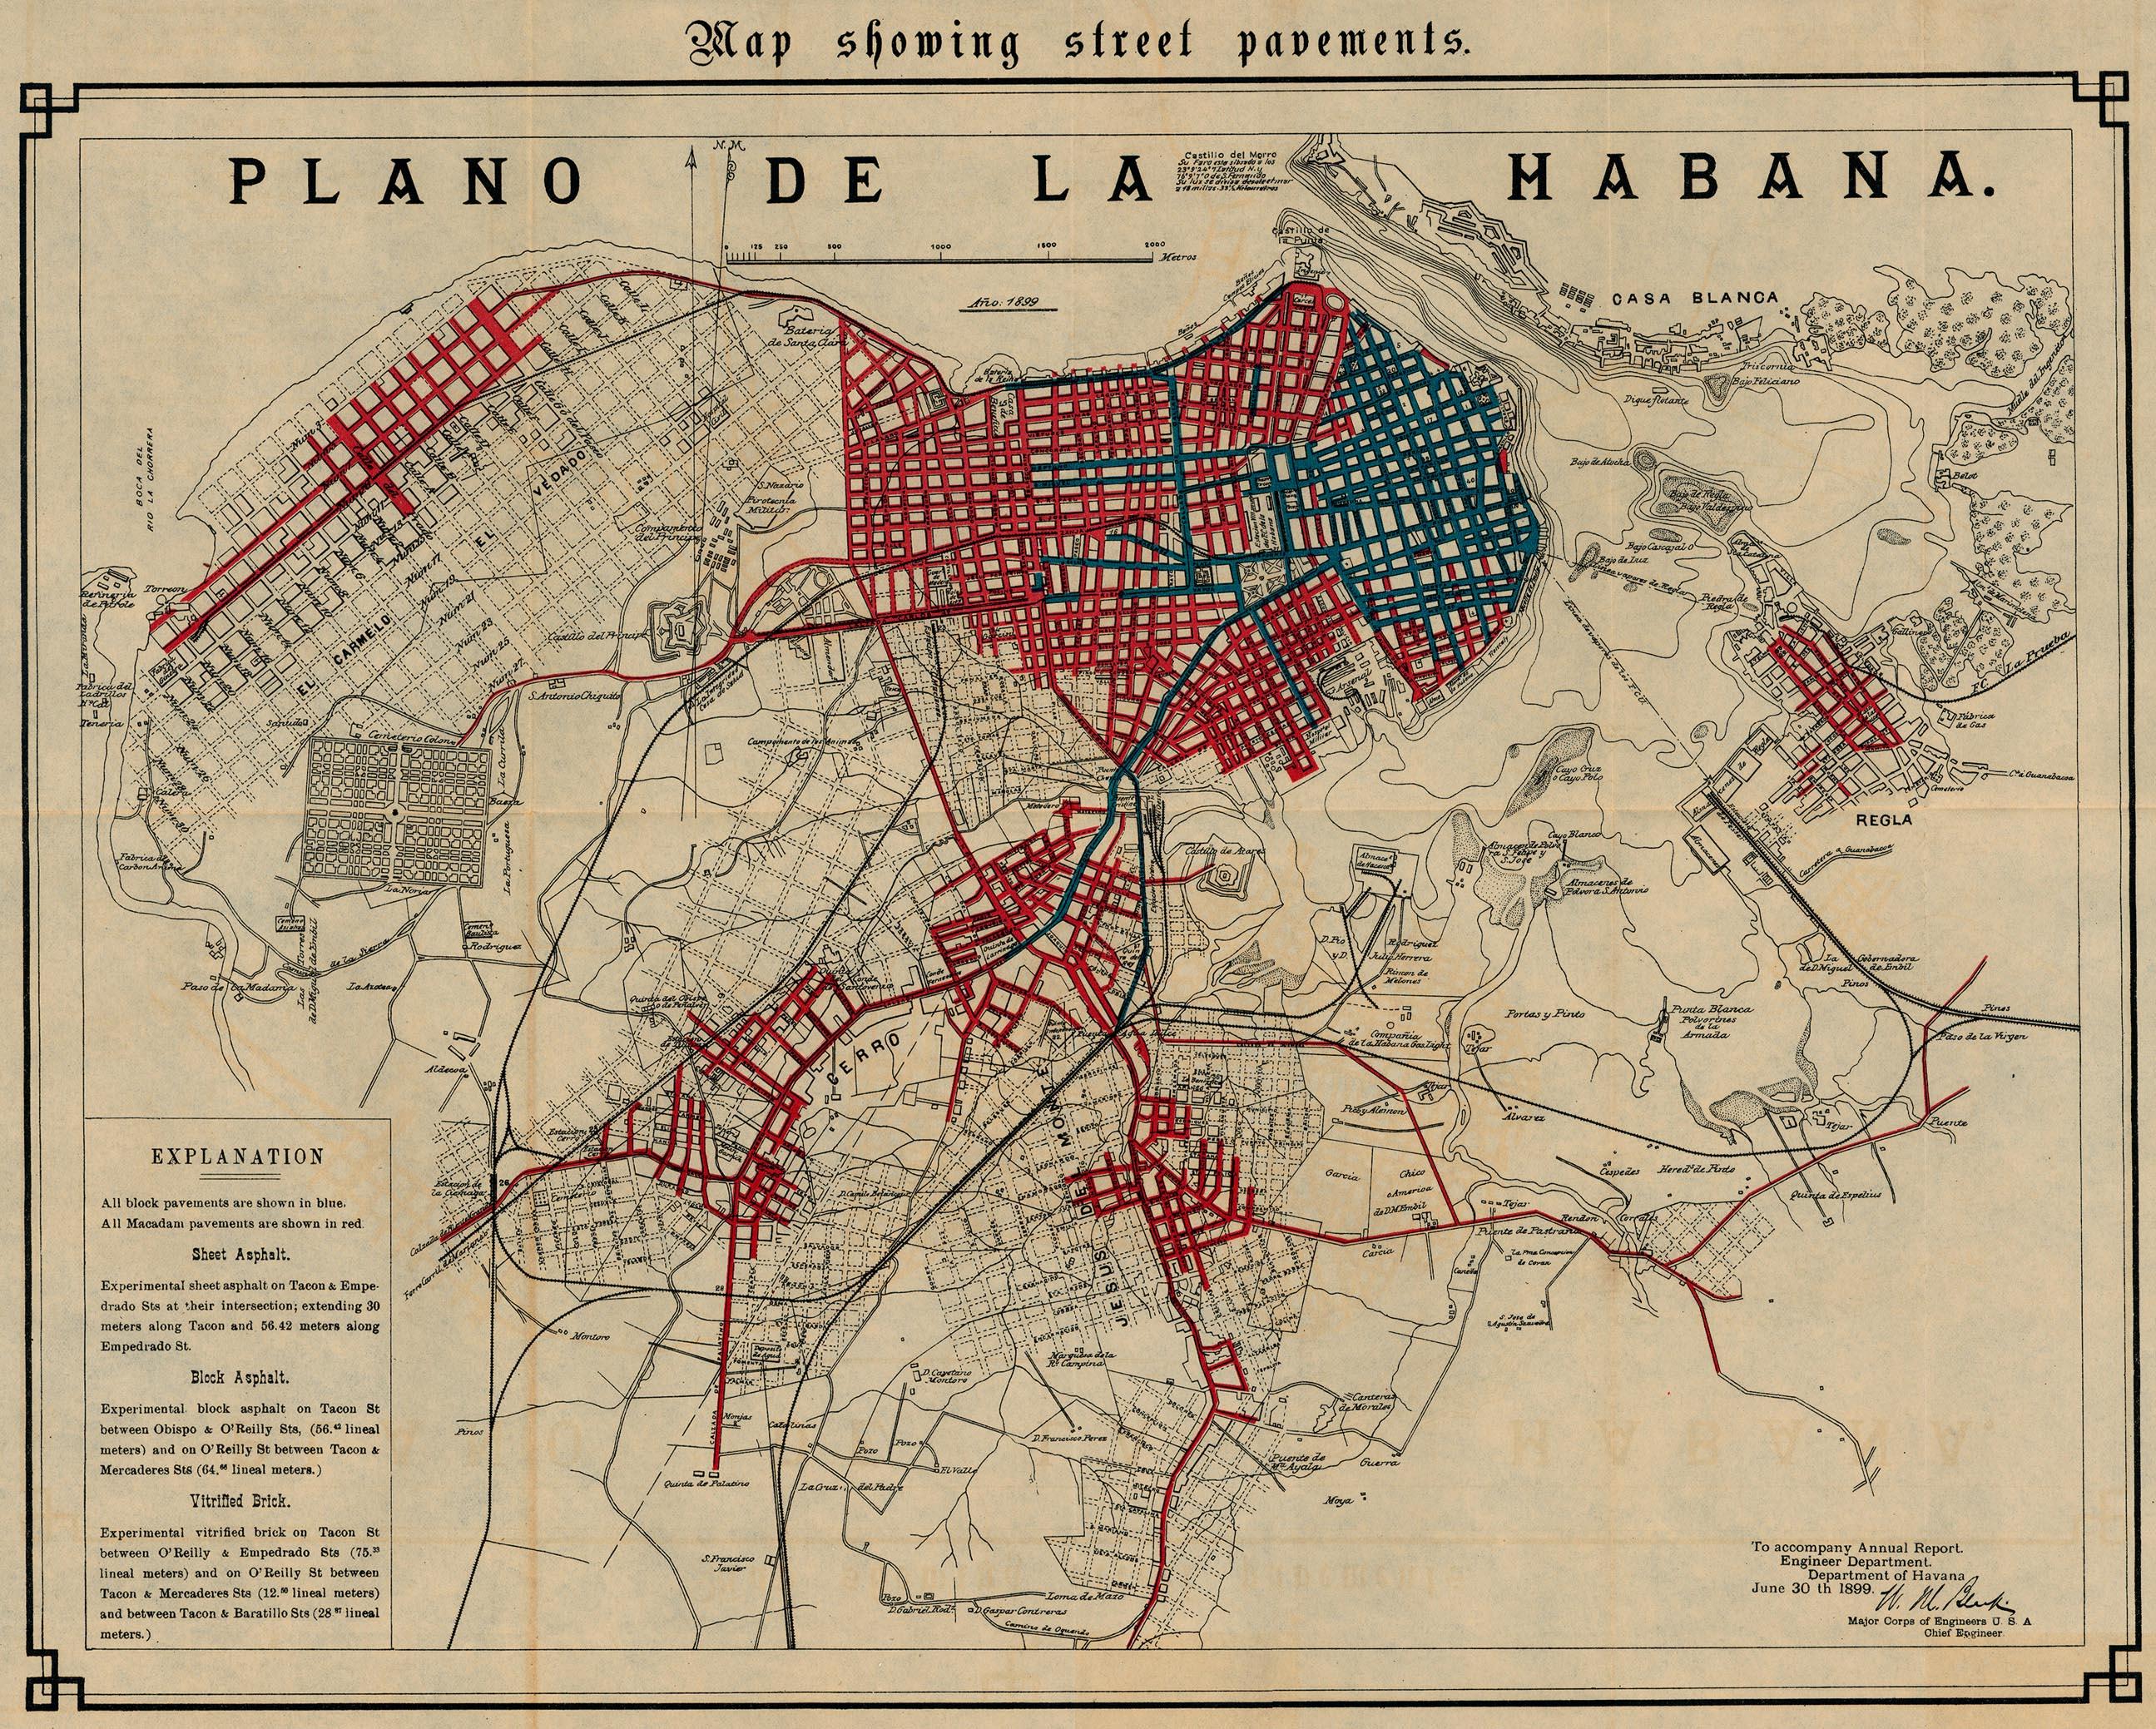 Havana Map Showing Street Pavements 1899